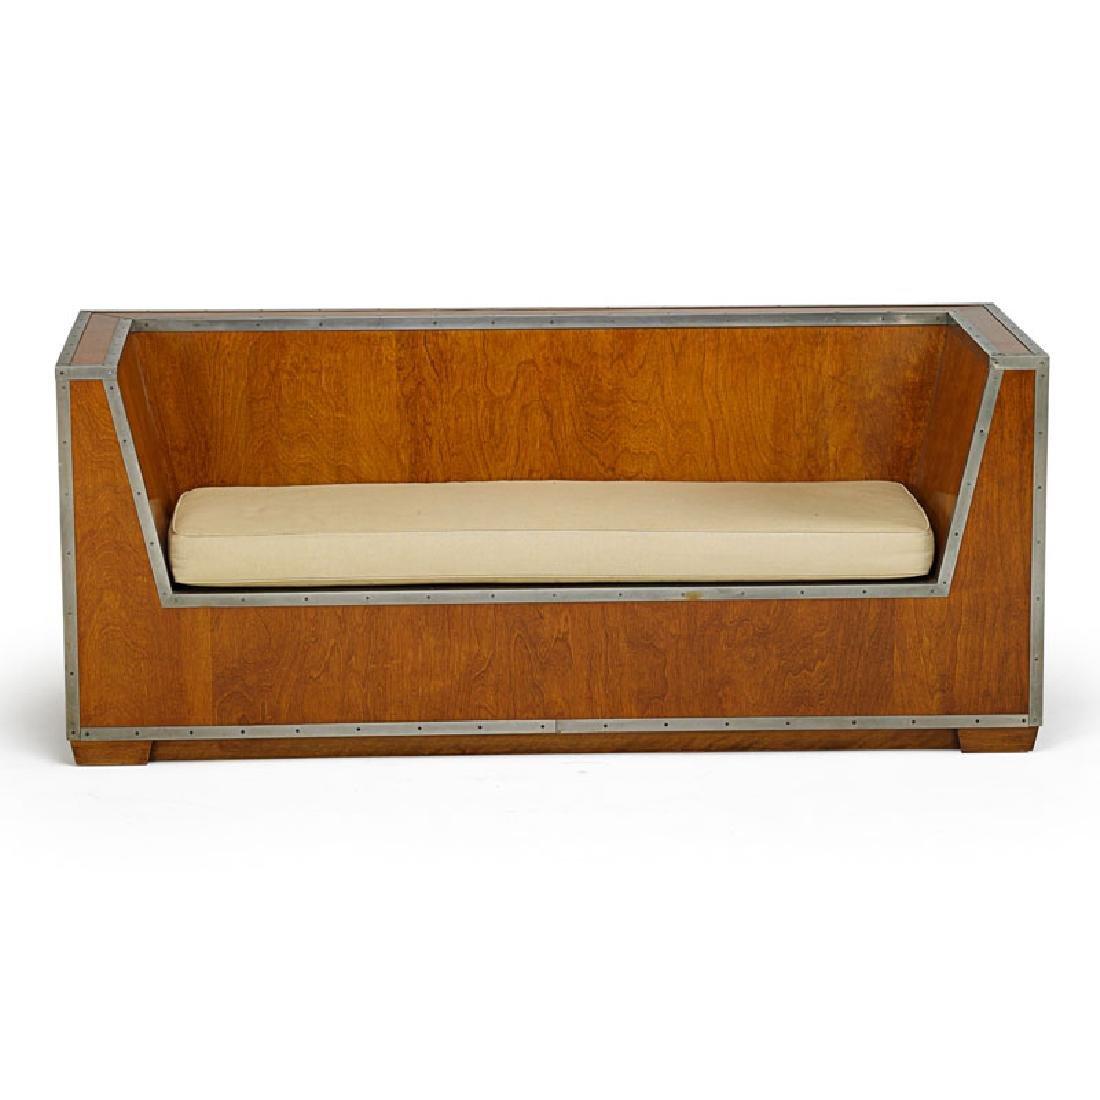 PAUL FRANKL Art Deco sofa - 2